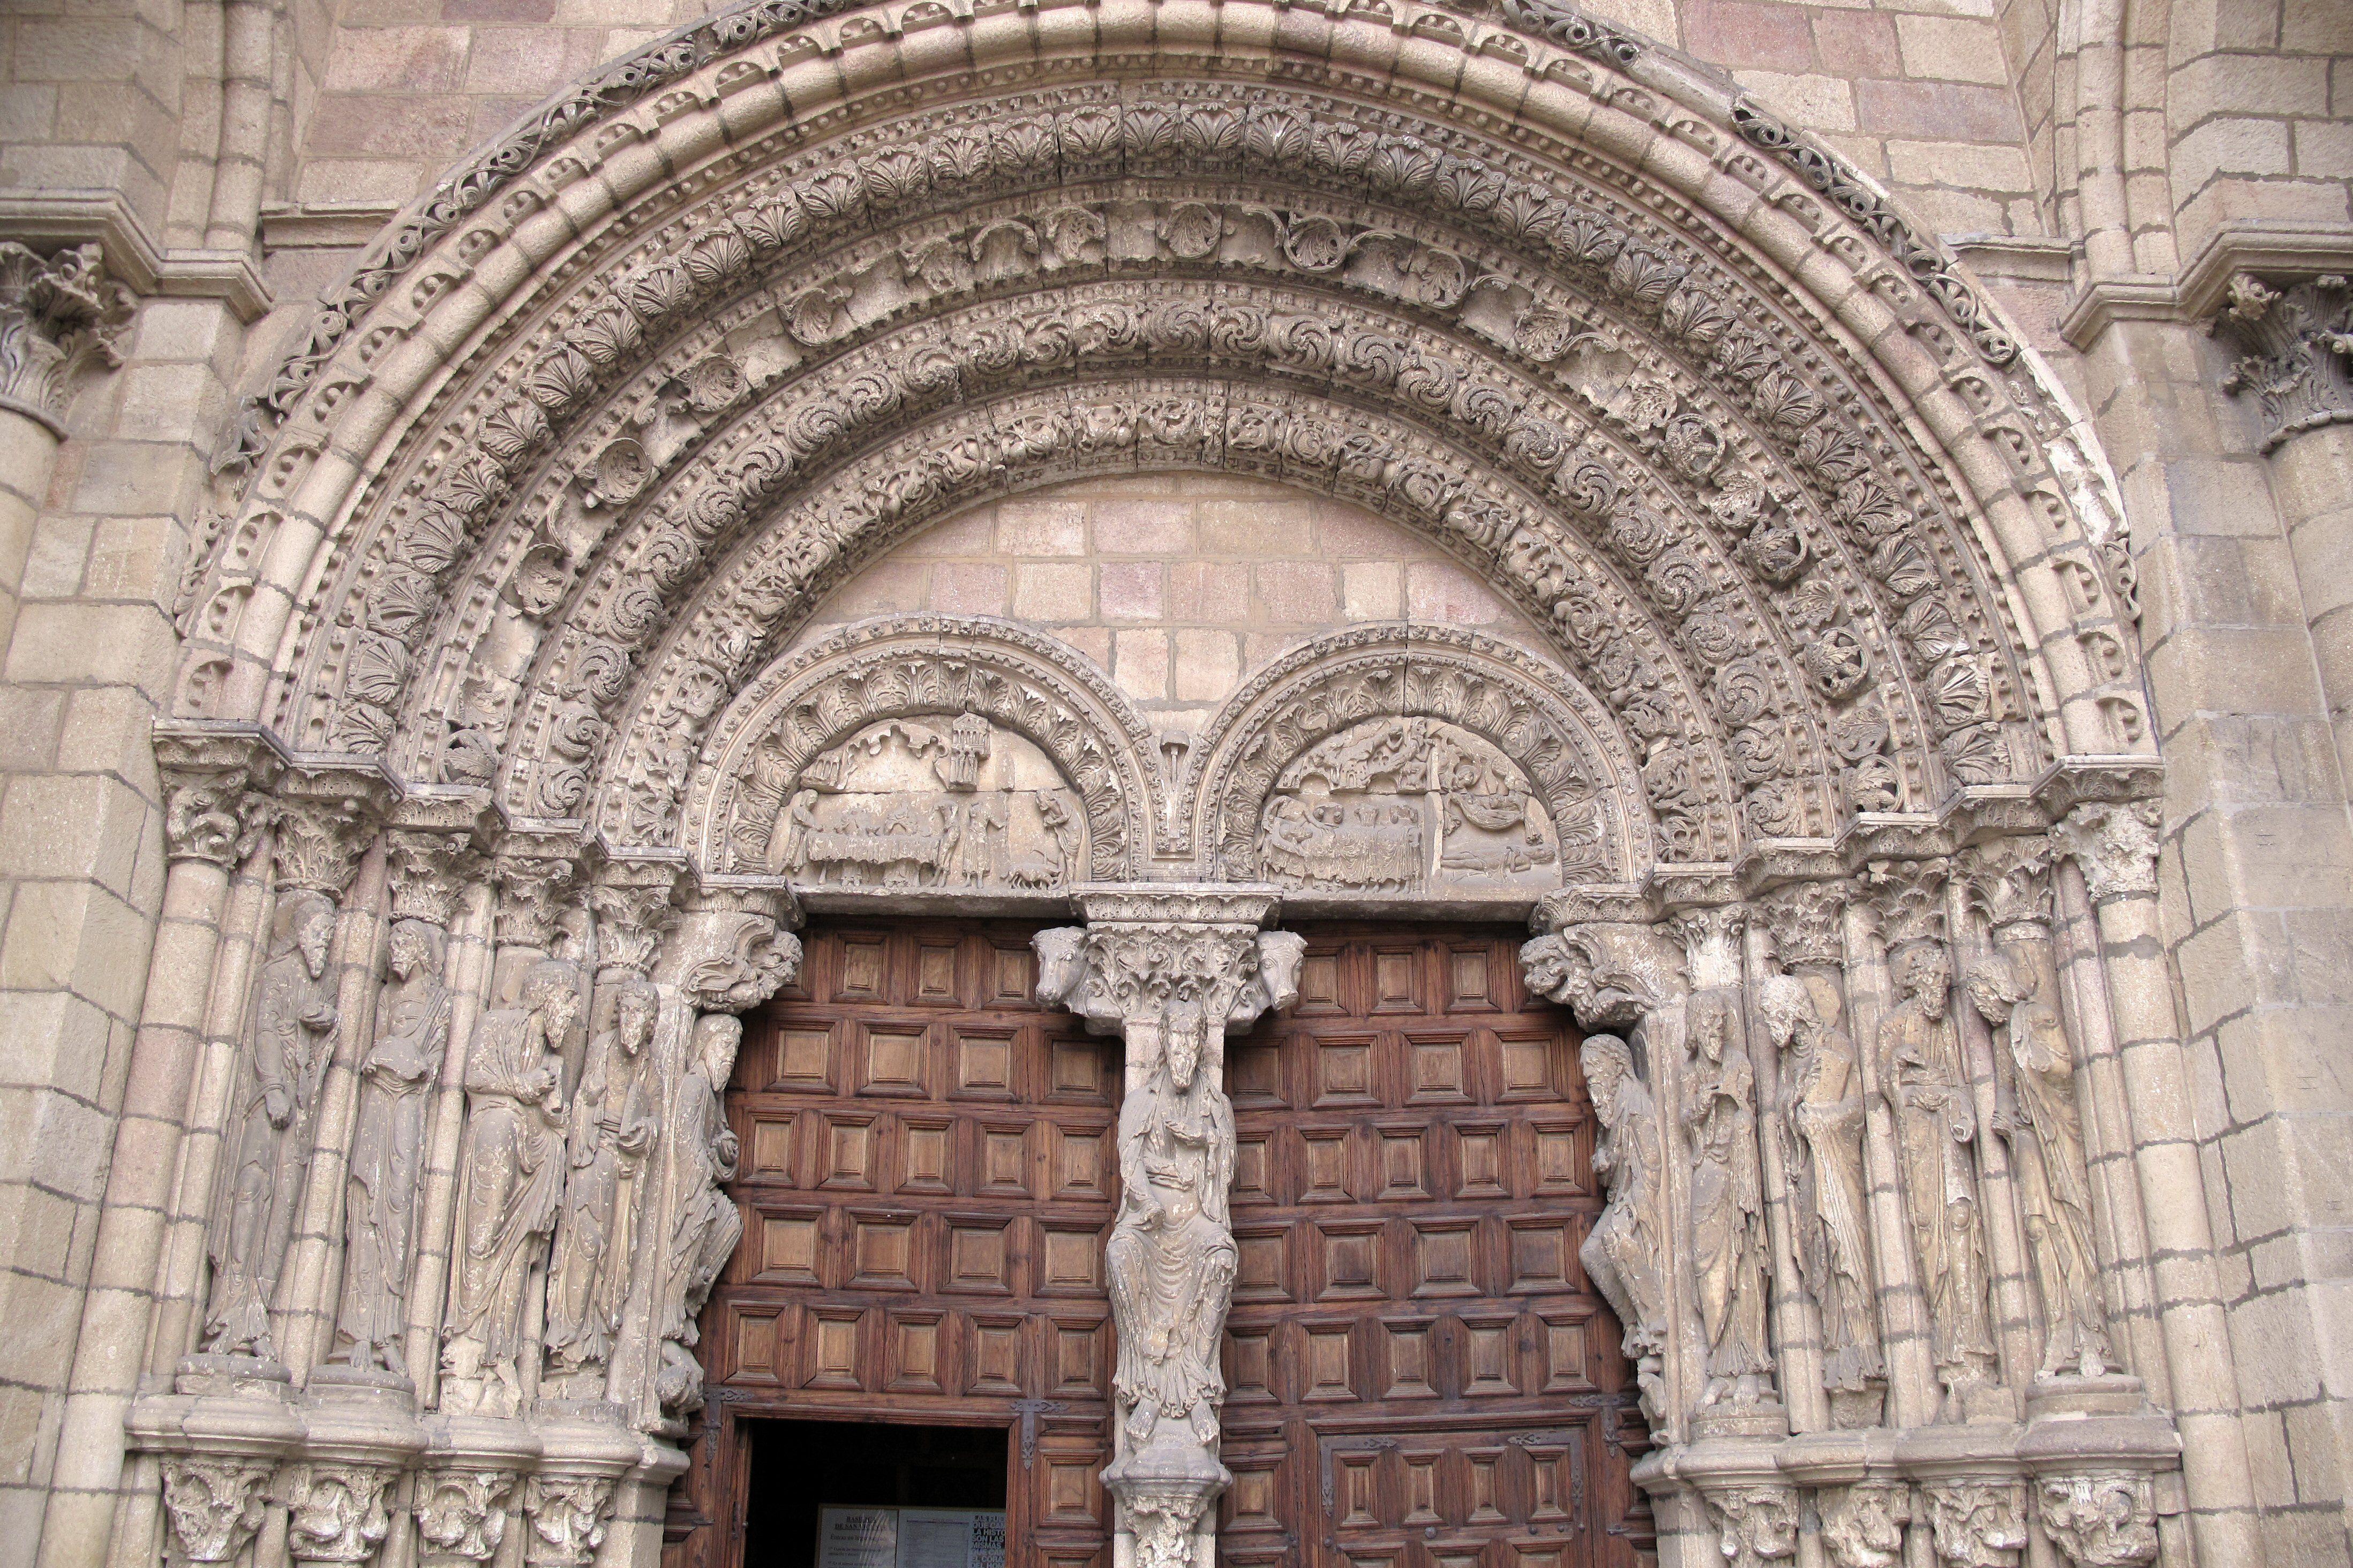 Arched Portico of the Romanesque Basilica de San Vicente, Avila, Spain